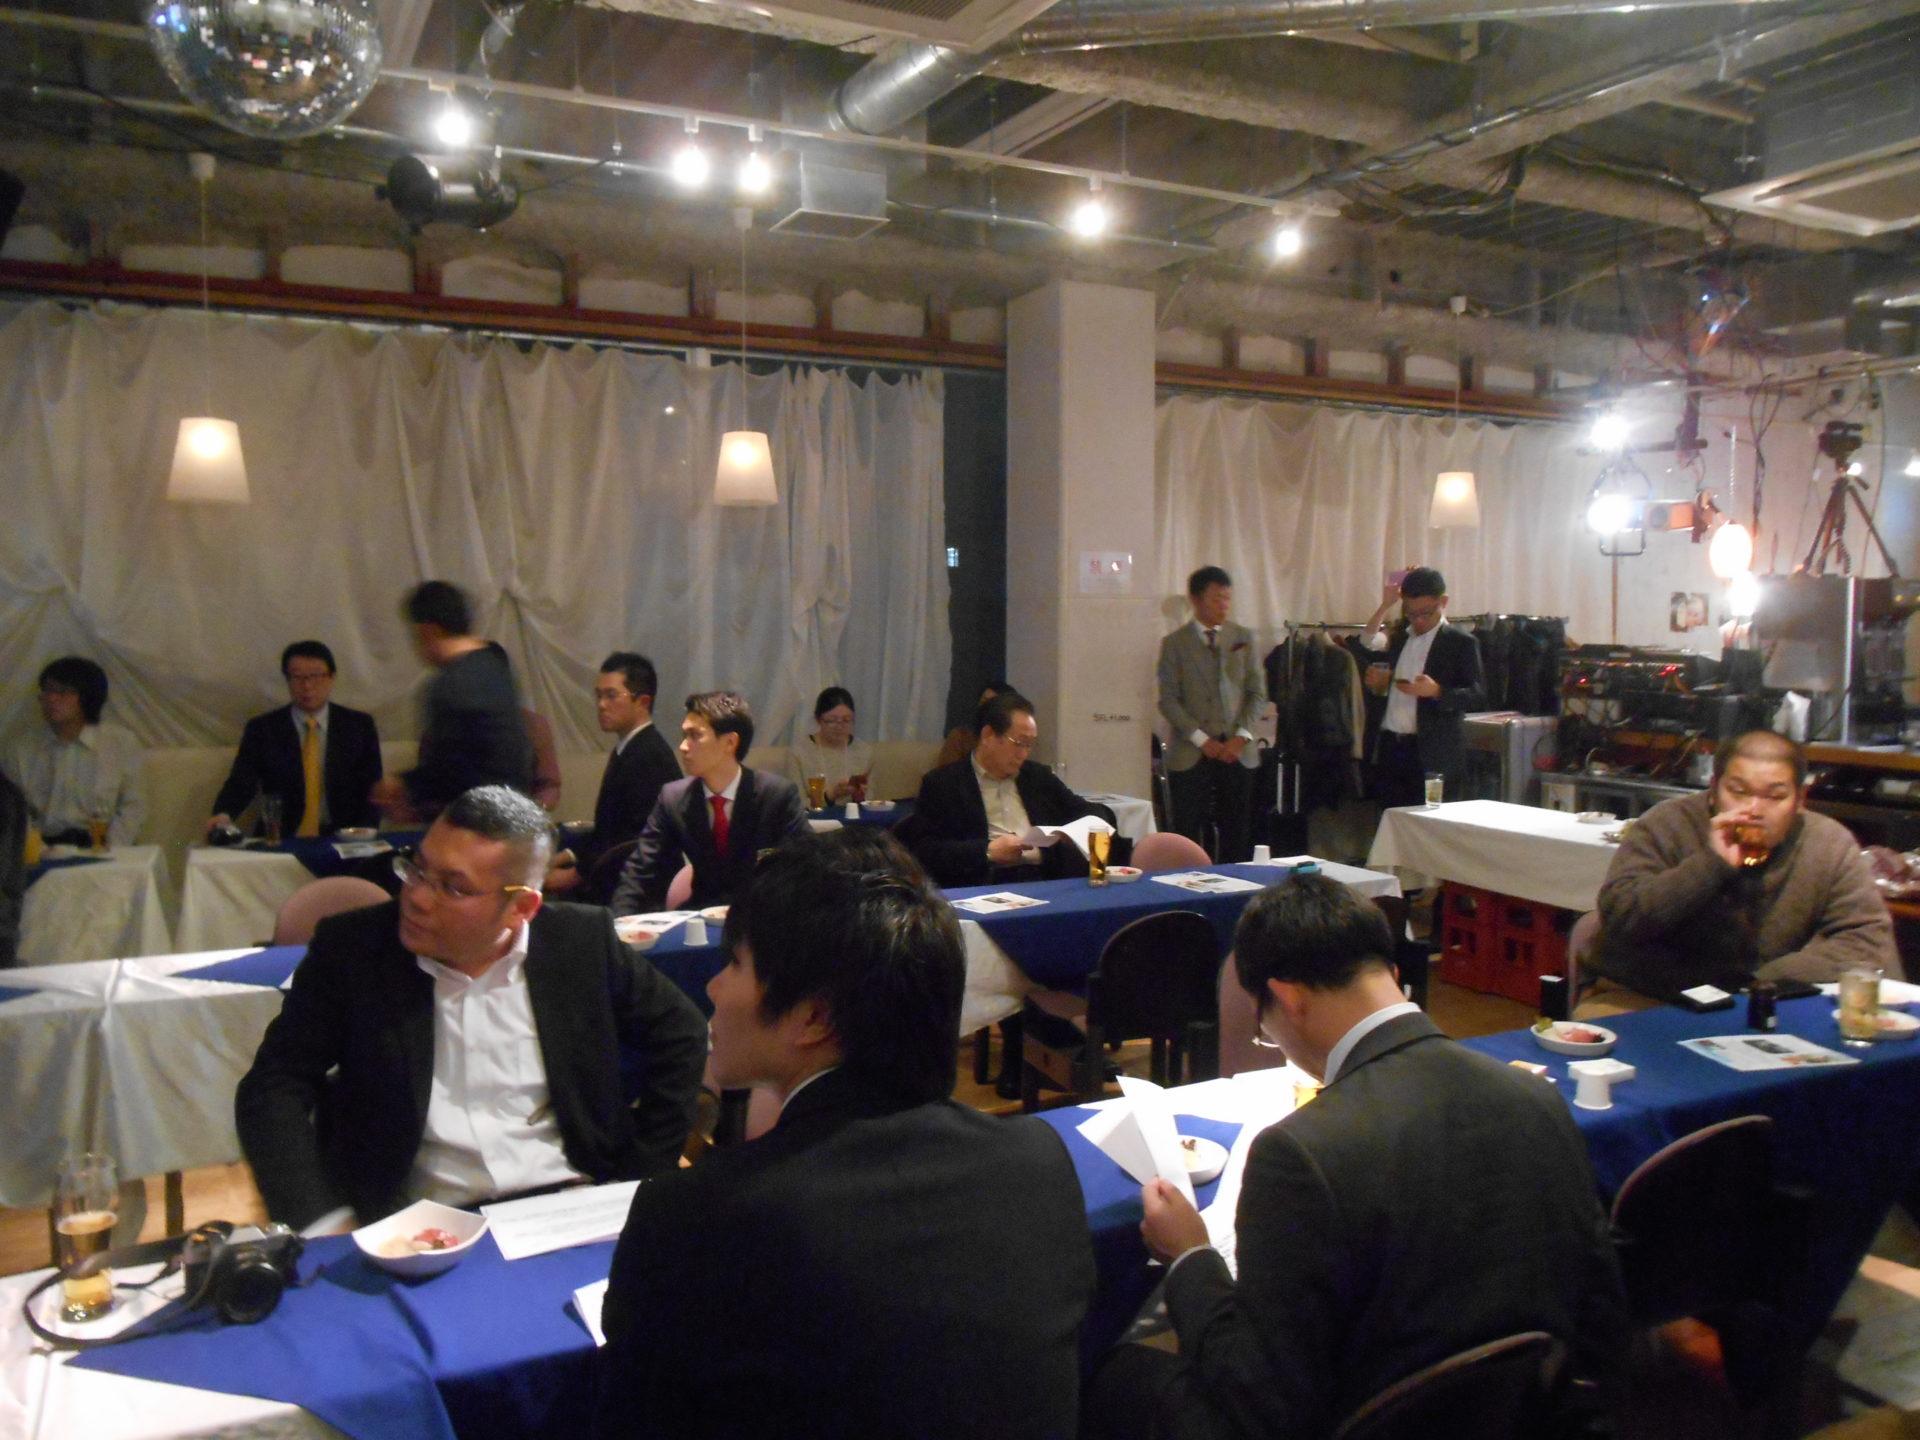 DSCN1054 1920x1440 - 2016年3月11日(金)AOsuki総会&パーティー開催しました。